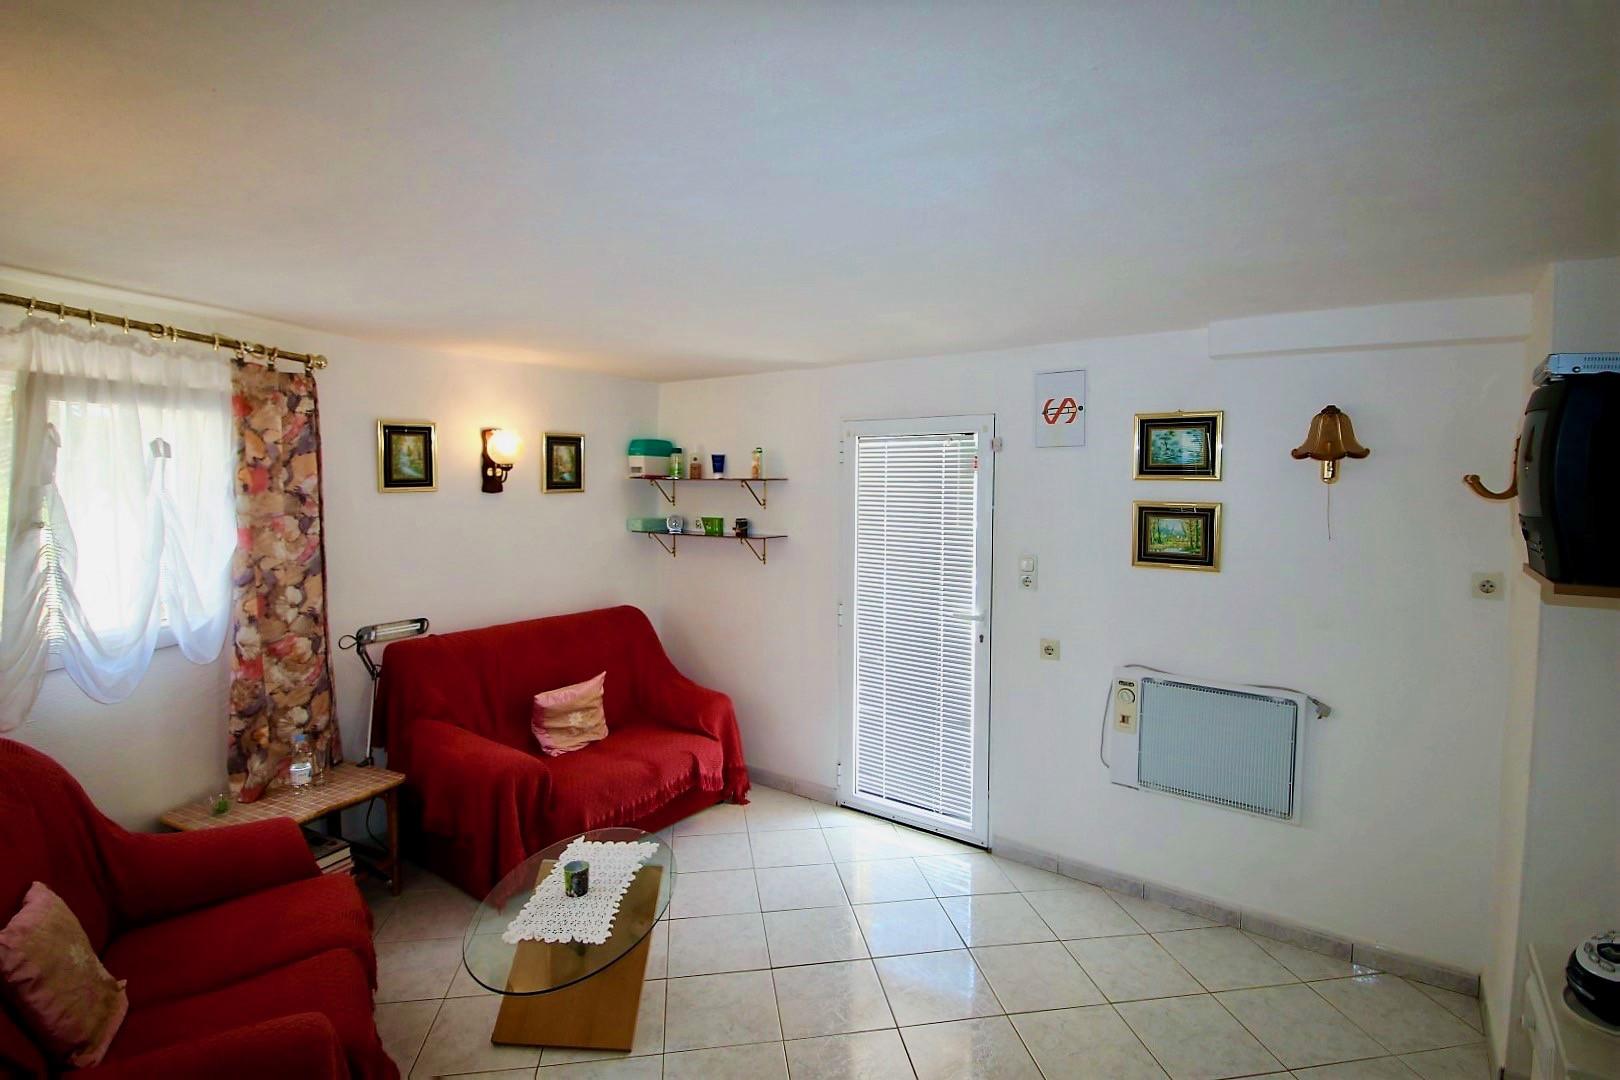 Sommerküche Living At Home : Villen denia don quijote studio denia costa blanca